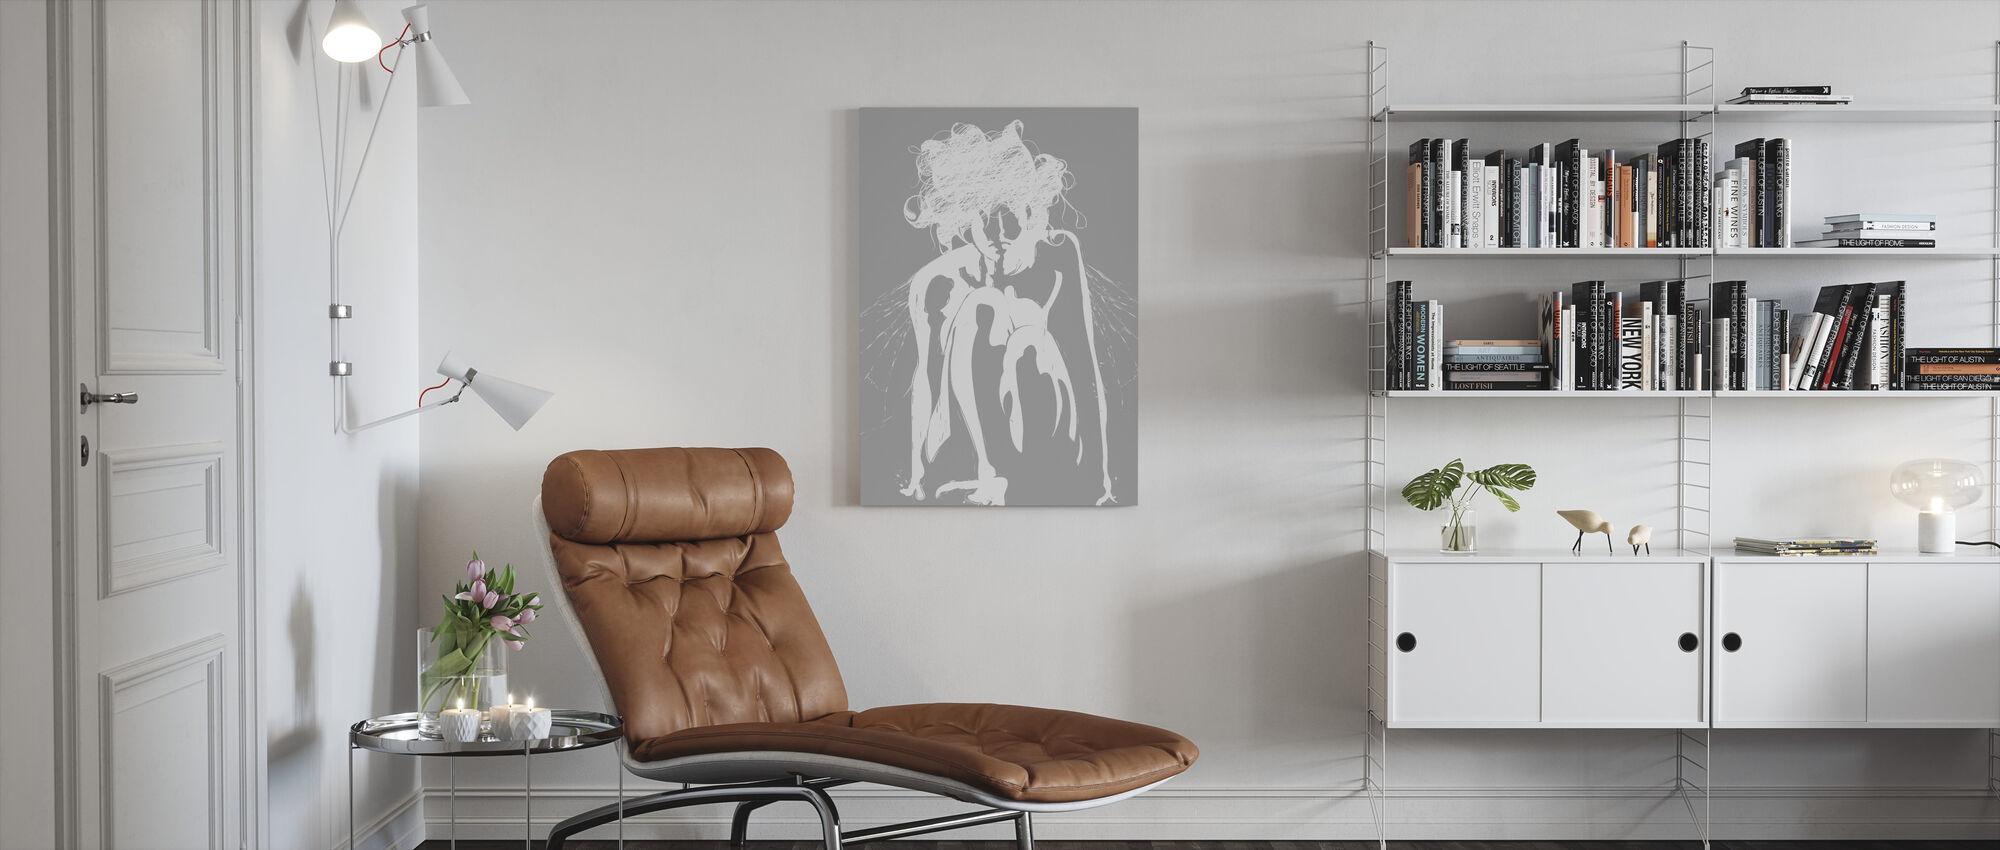 Tingeling - Ljusgrå - Canvastavla - Vardagsrum